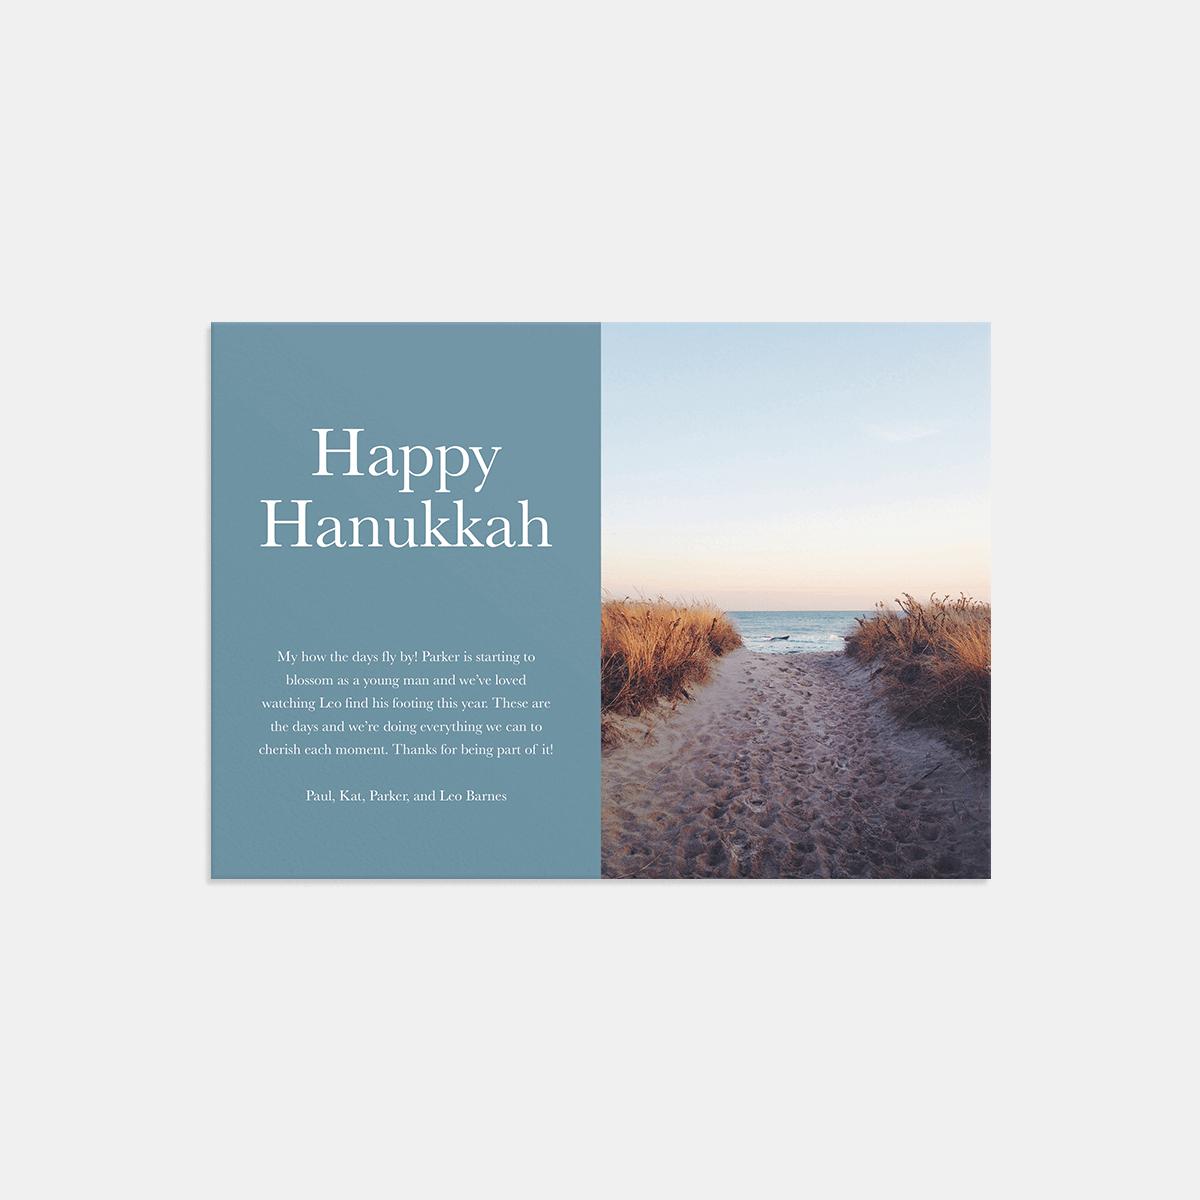 Same photo of footprints in sand on Happy Hanukkah card